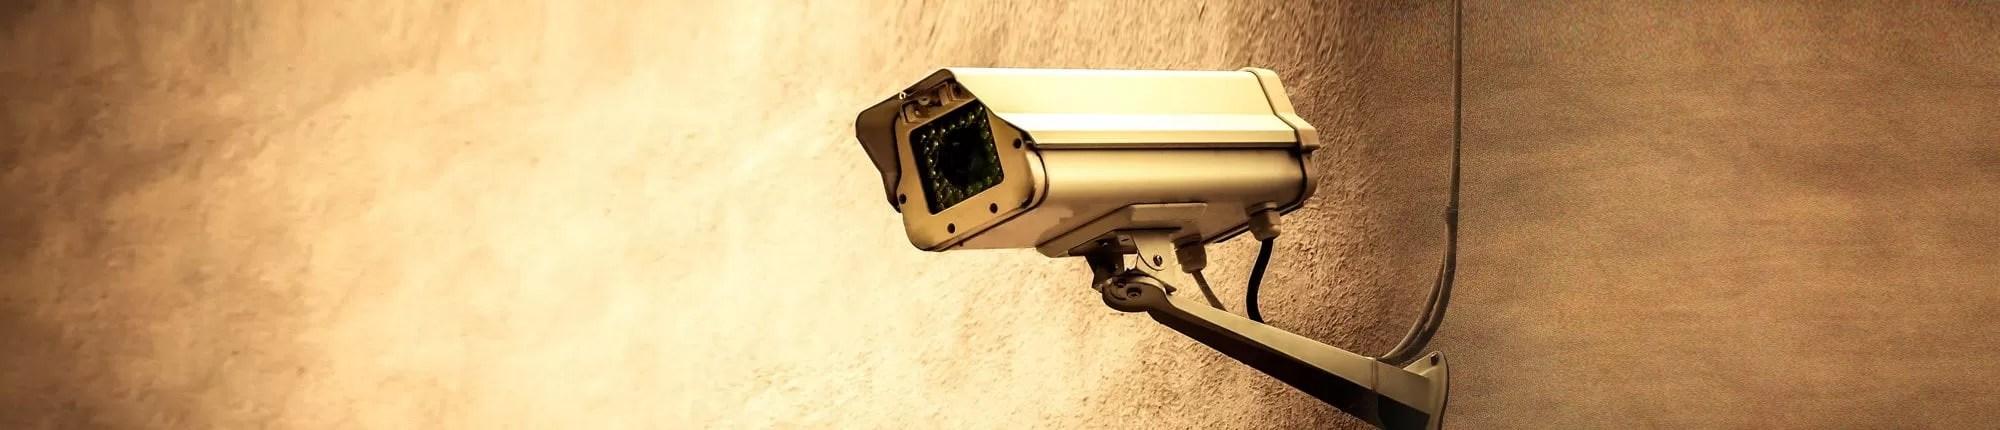 BBG security camera Oakville